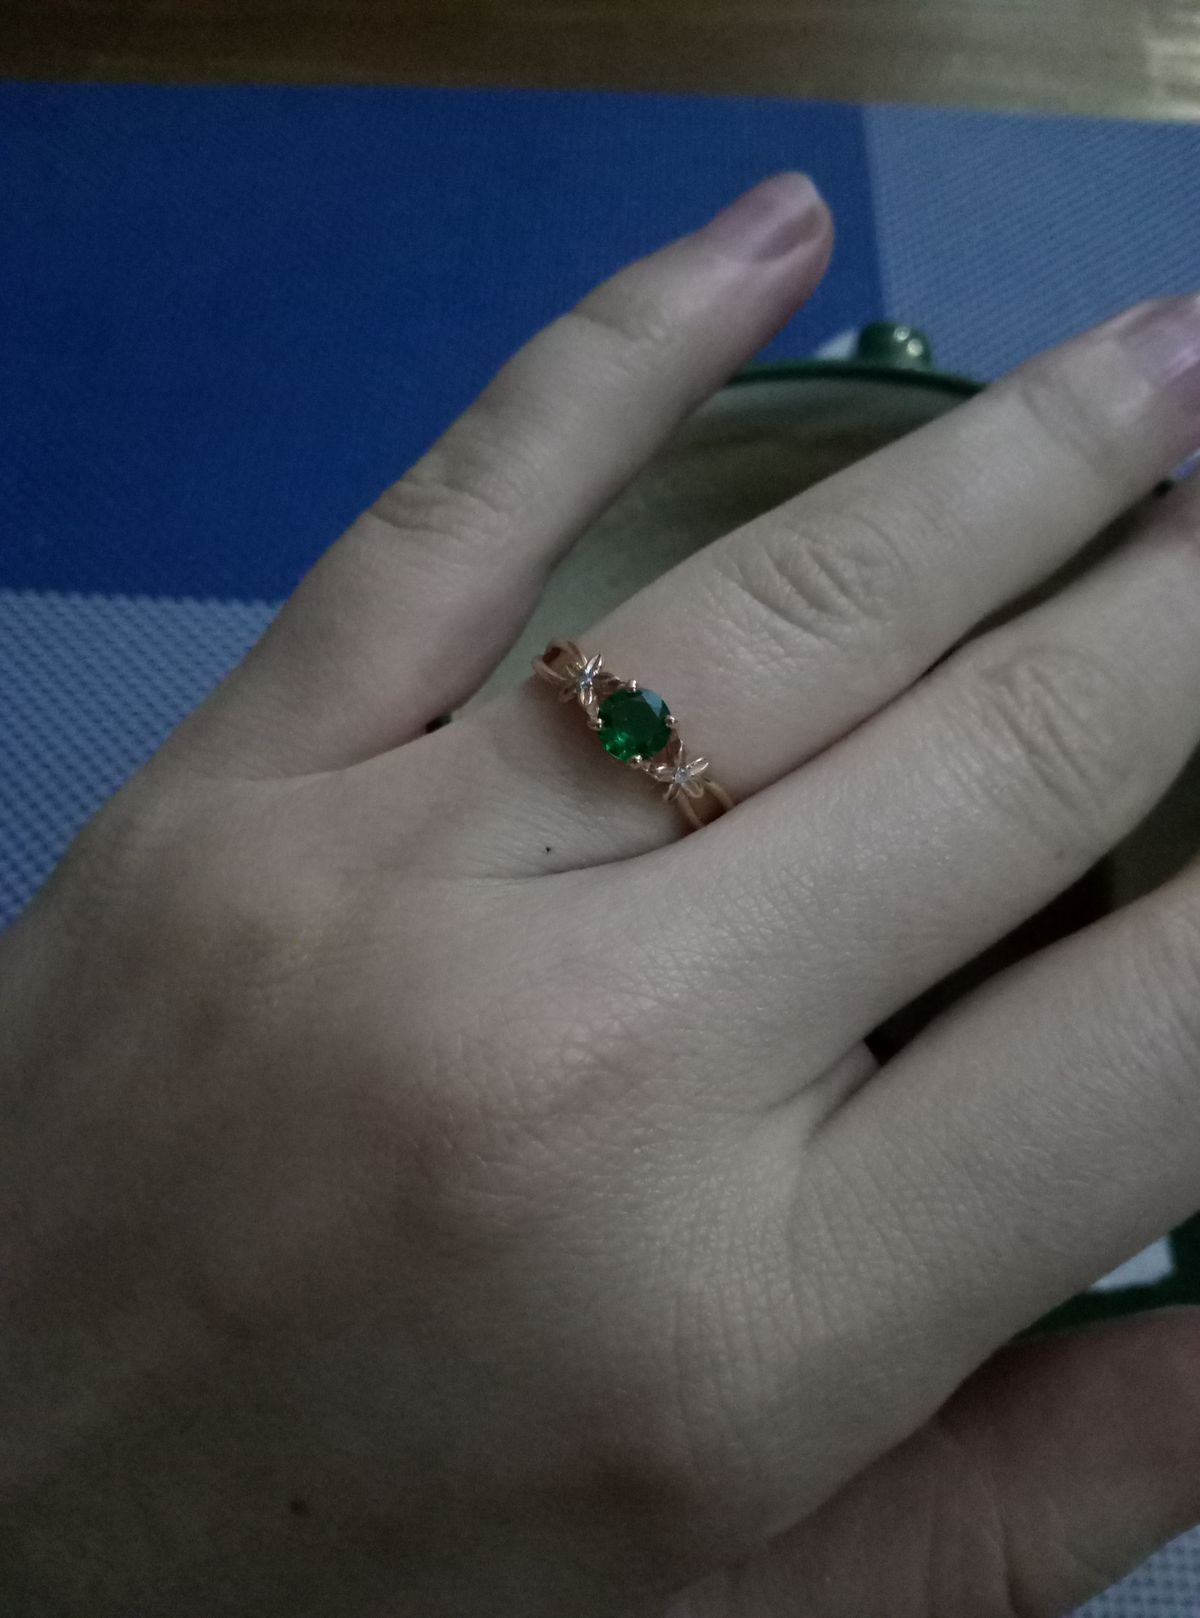 Красивое кольцо, смотриться шикарно